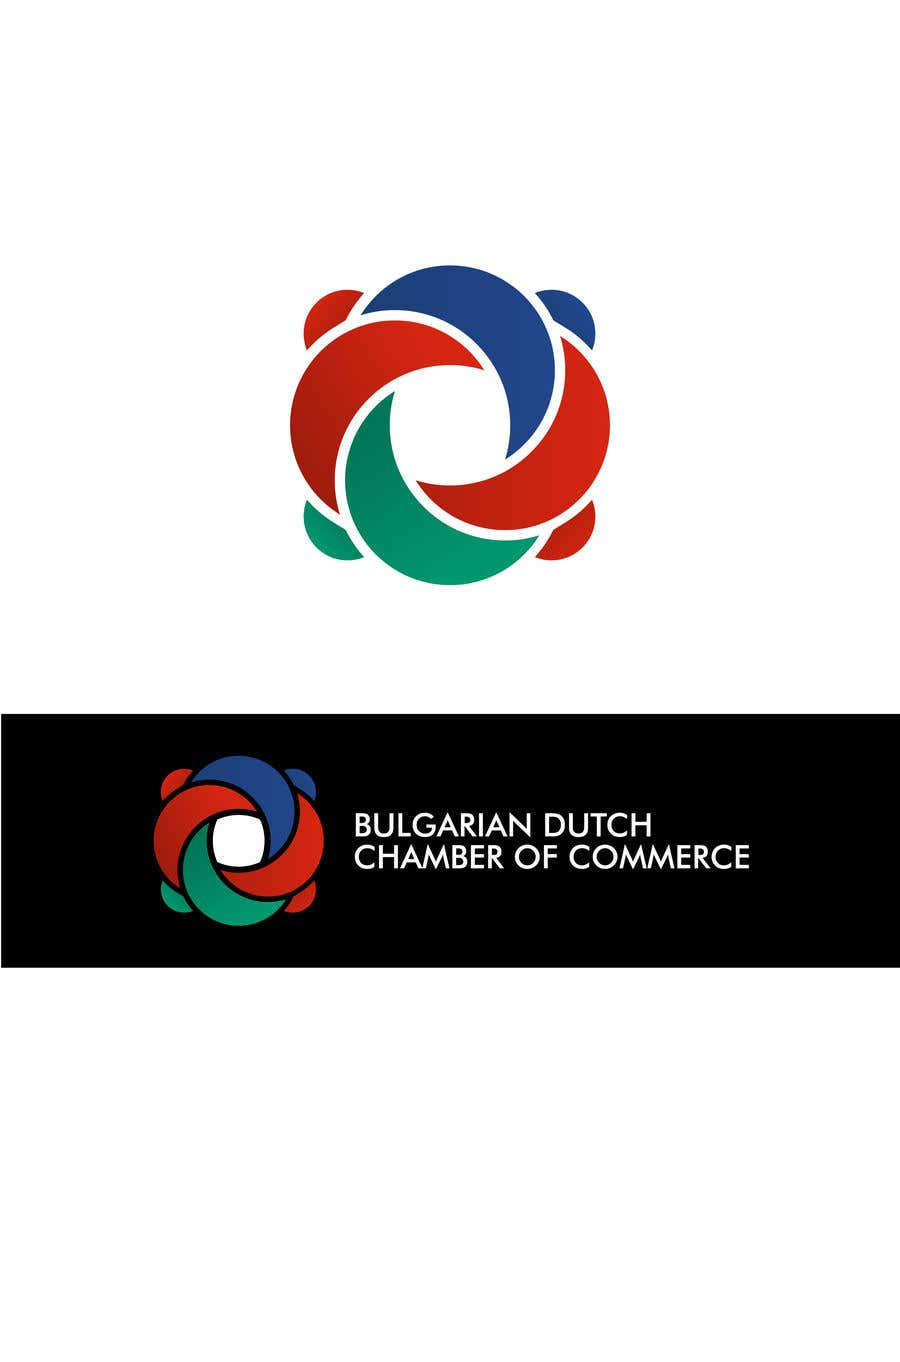 Konkurrenceindlæg #                                        90                                      for                                         New company logo incorporating Dutch and Bulgarian symbols